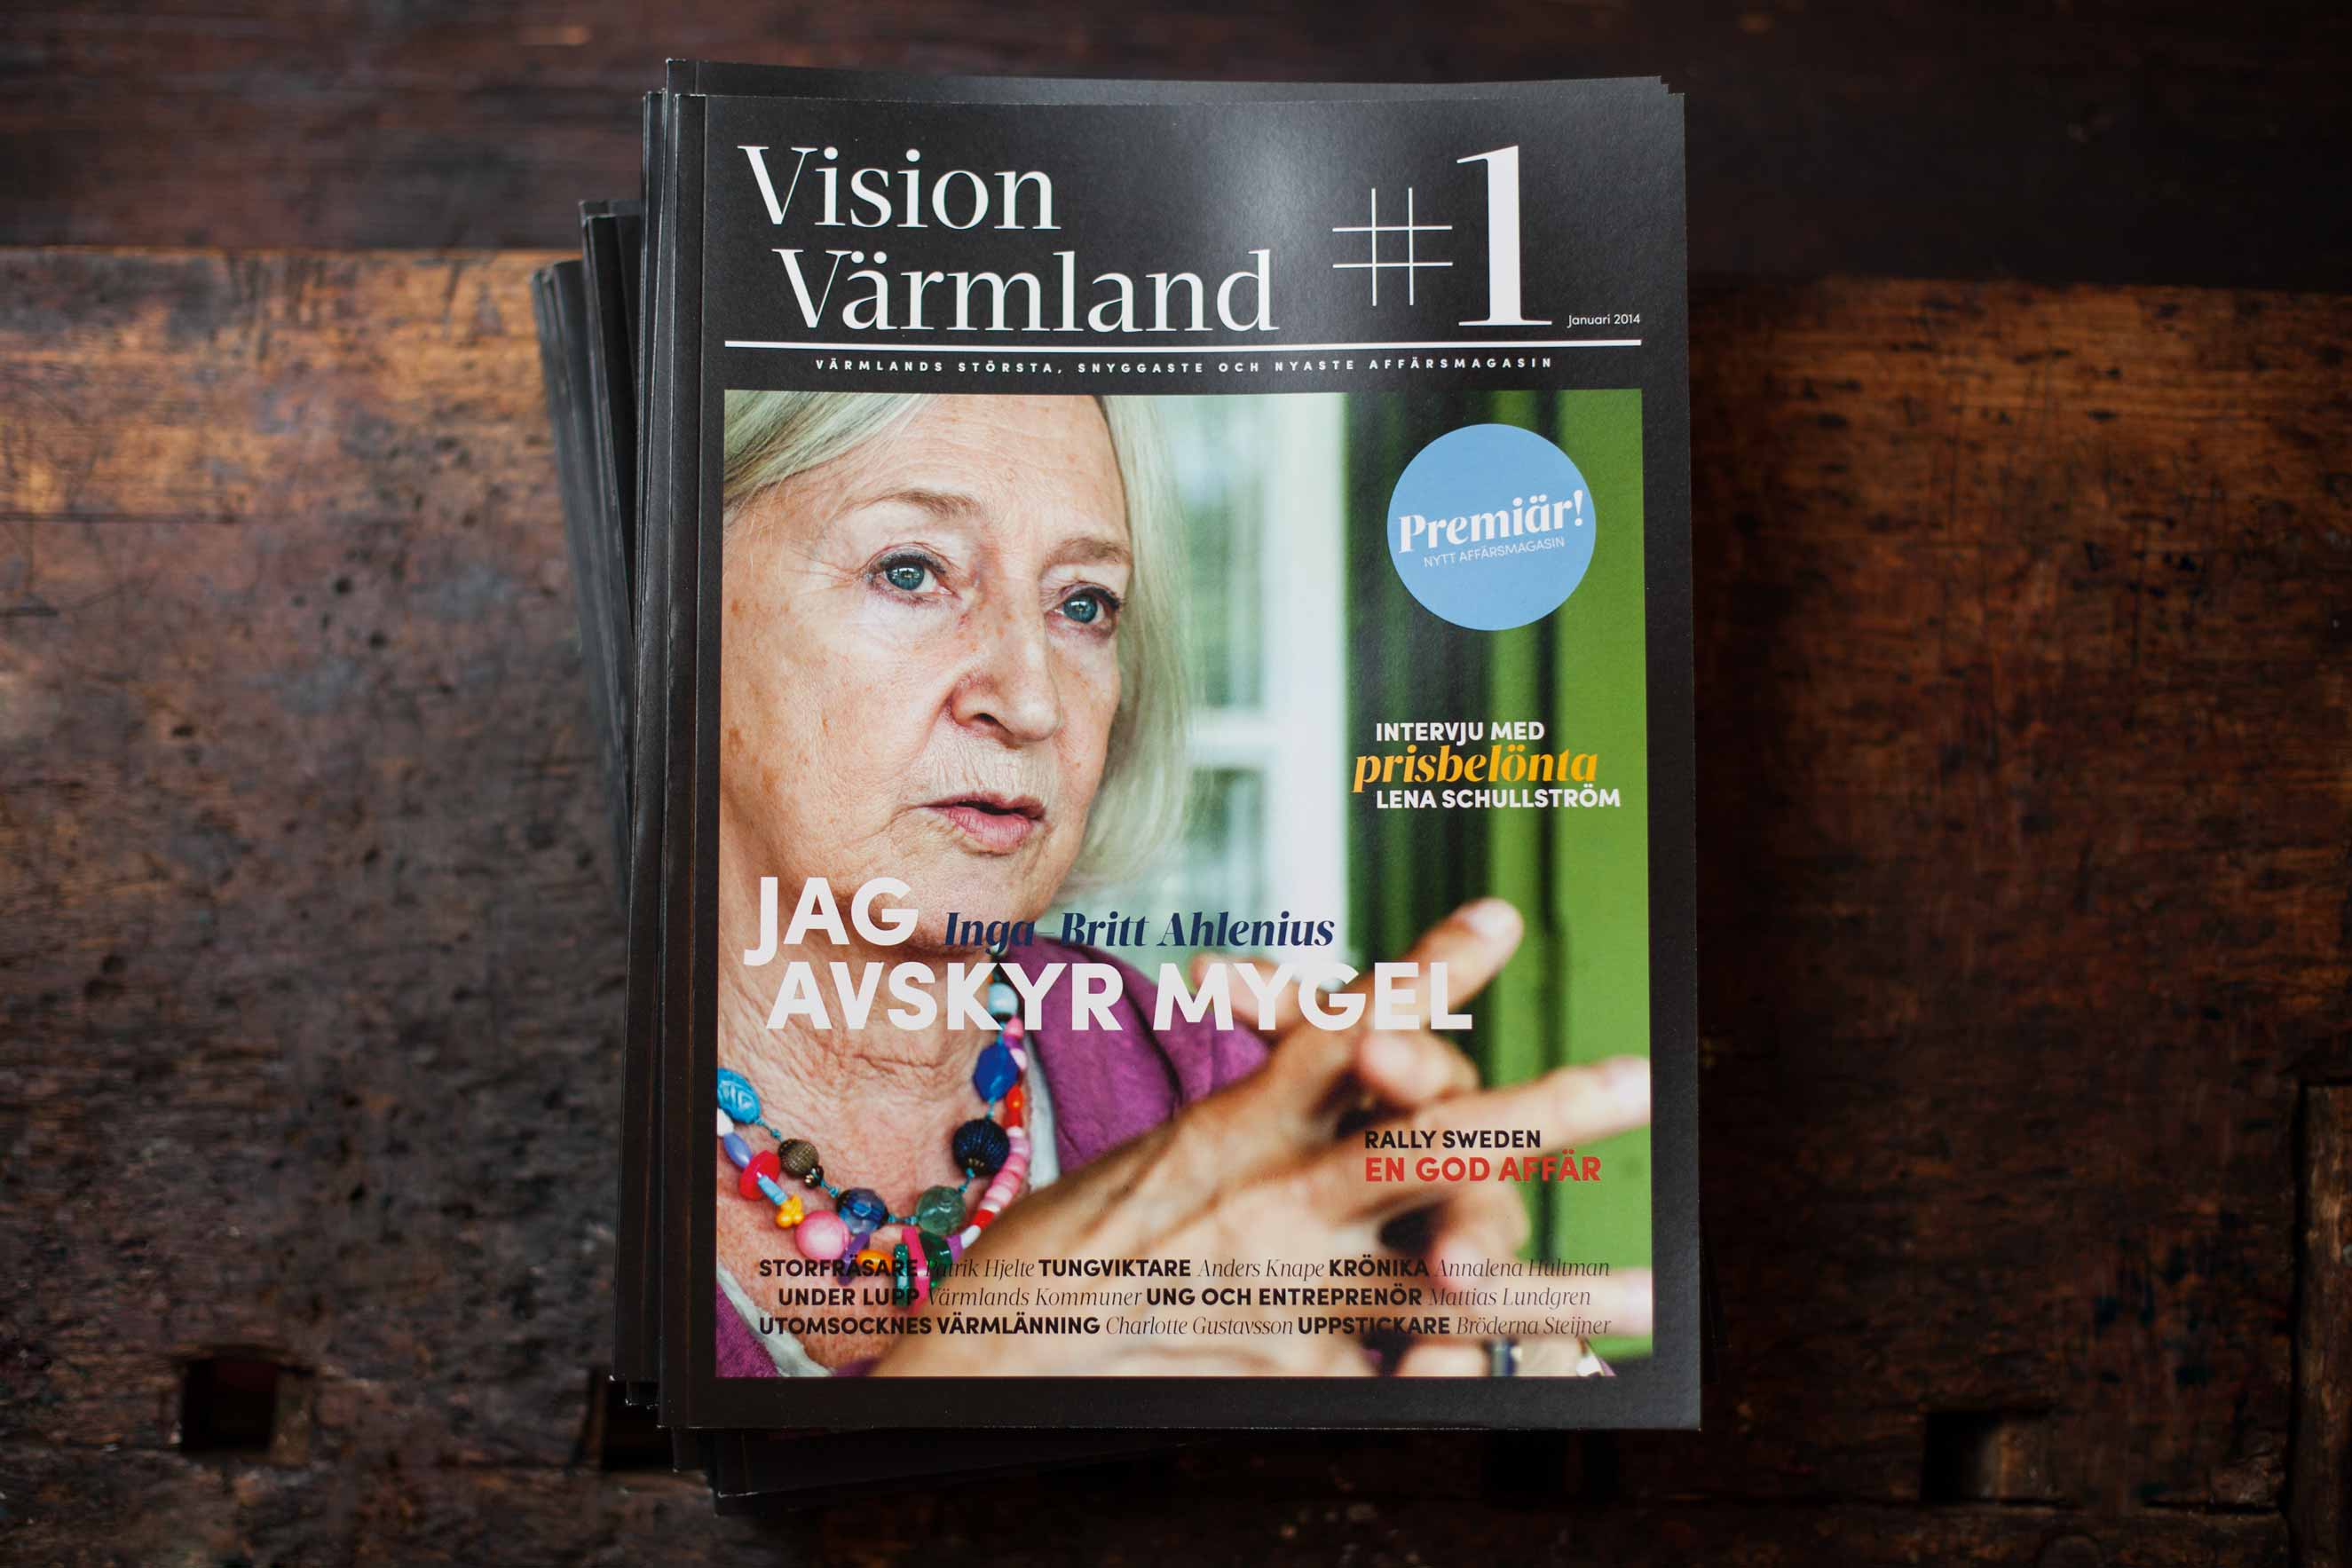 Vision Värmland